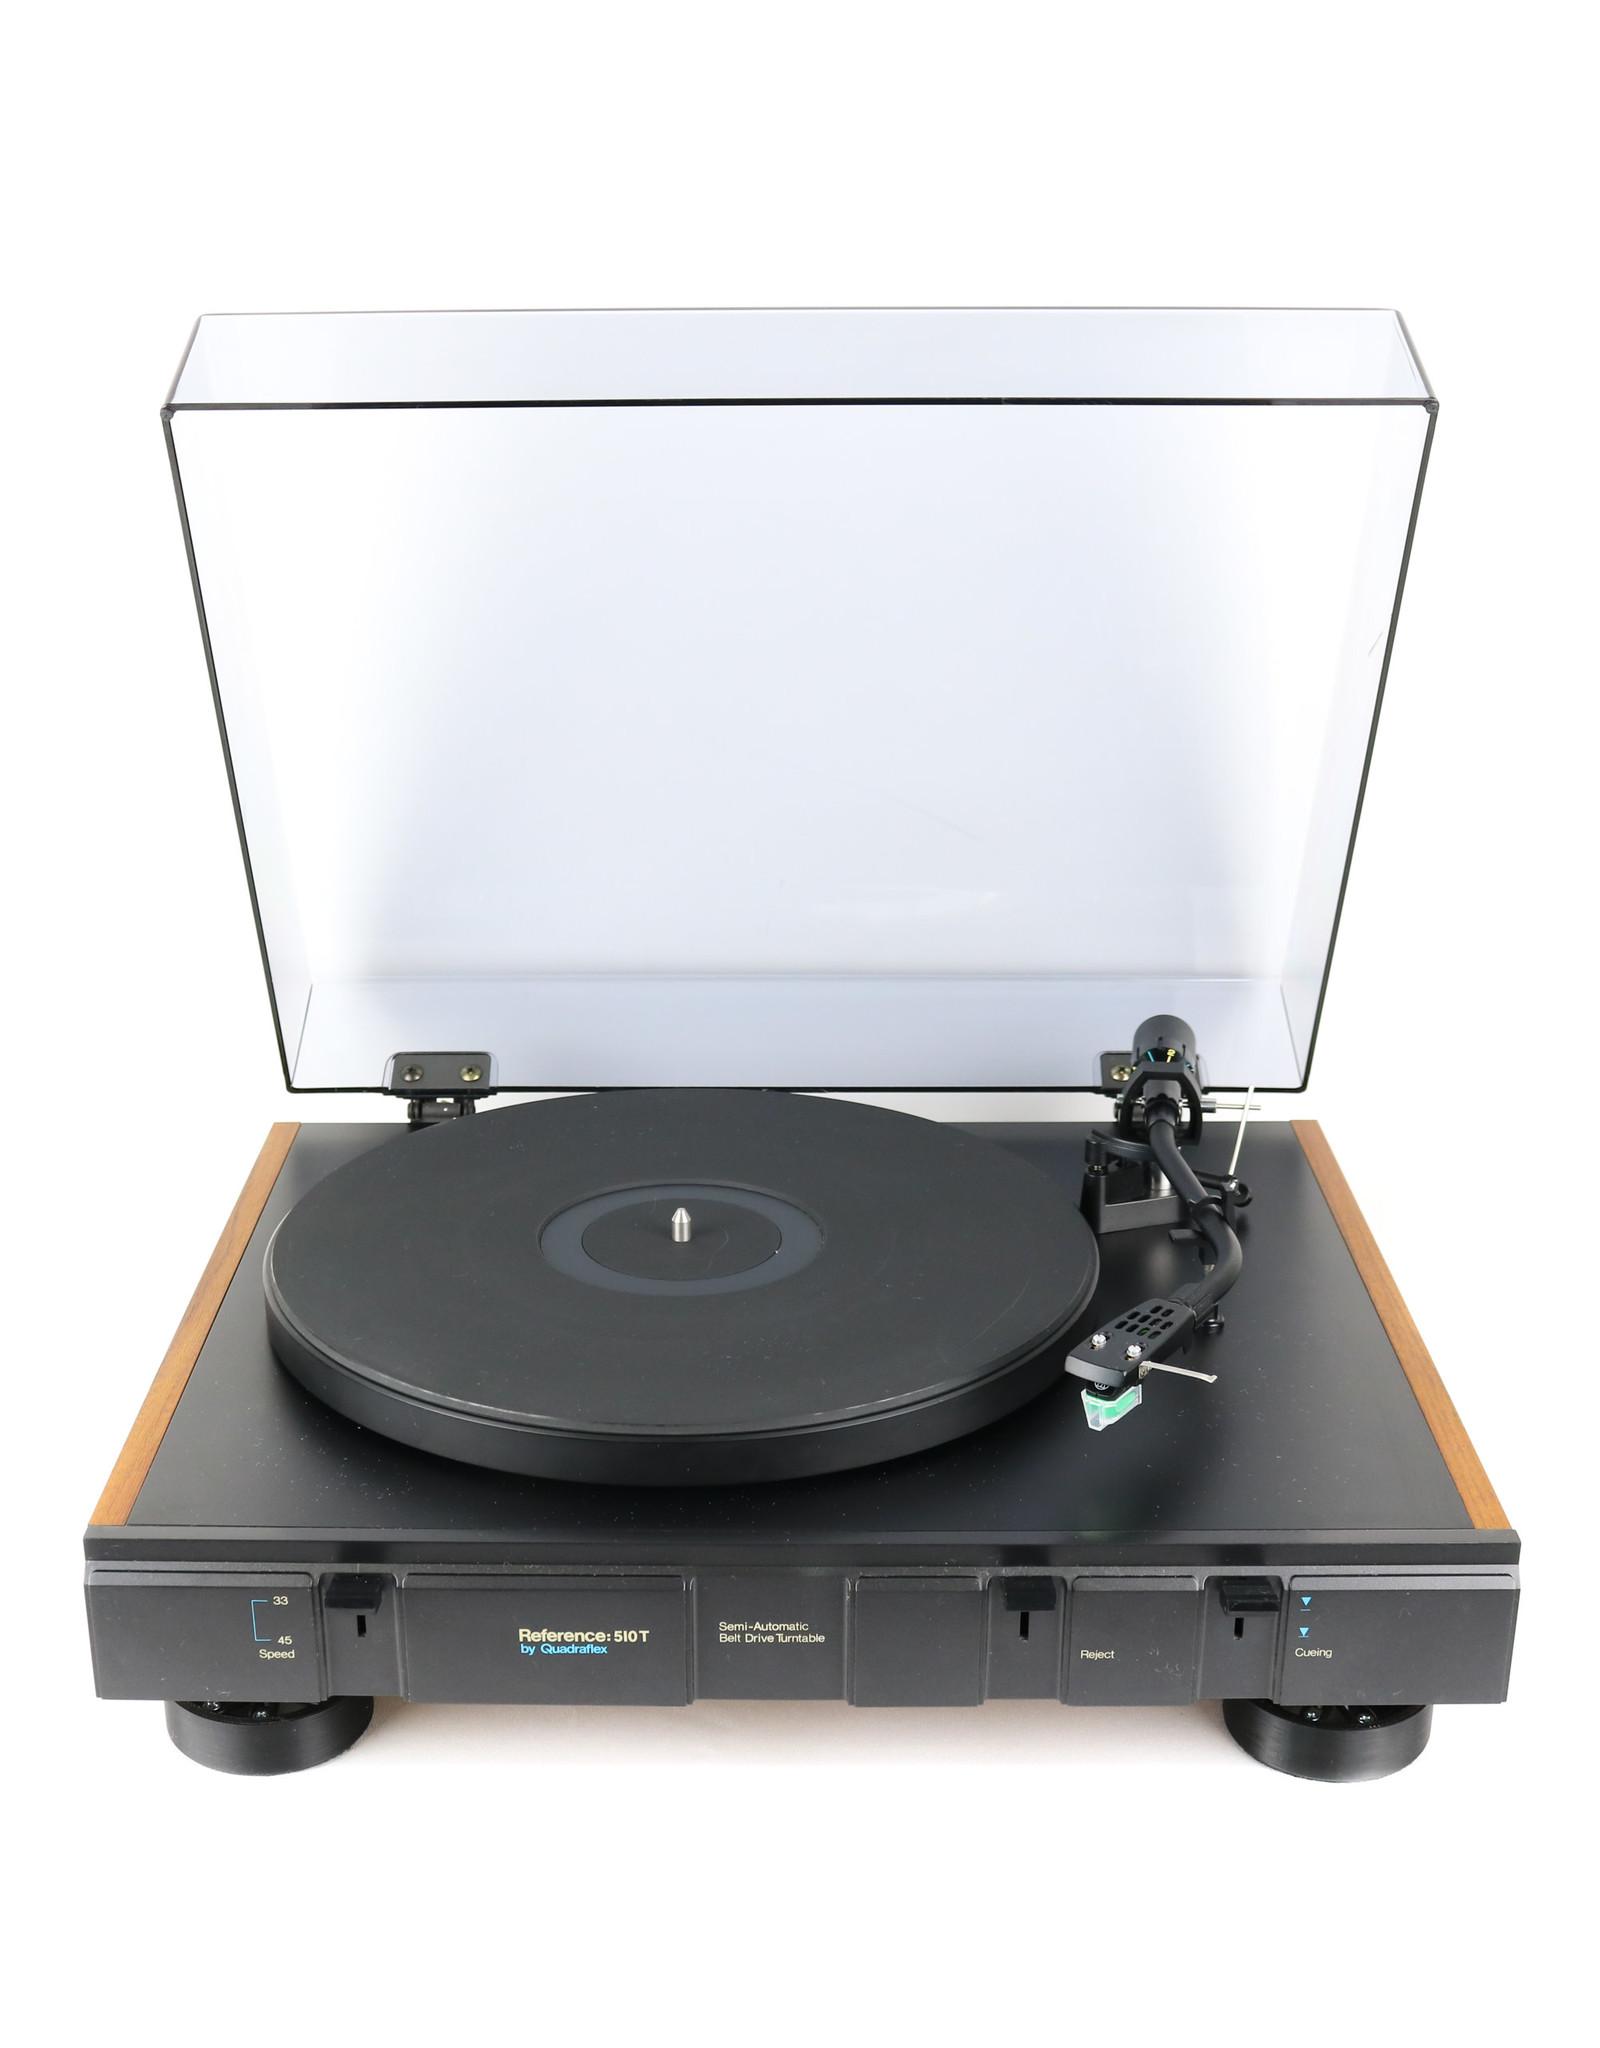 Quadraflex Quadraflex Reference 510T Turntable USED